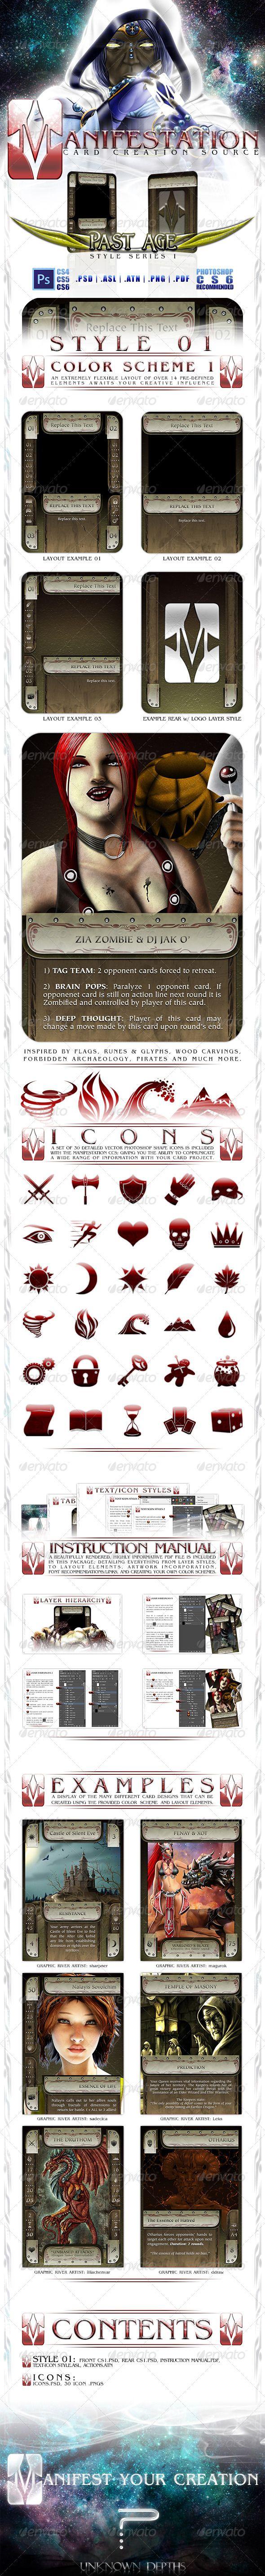 30 best graphics images on pinterest font logo fonts and script fonts